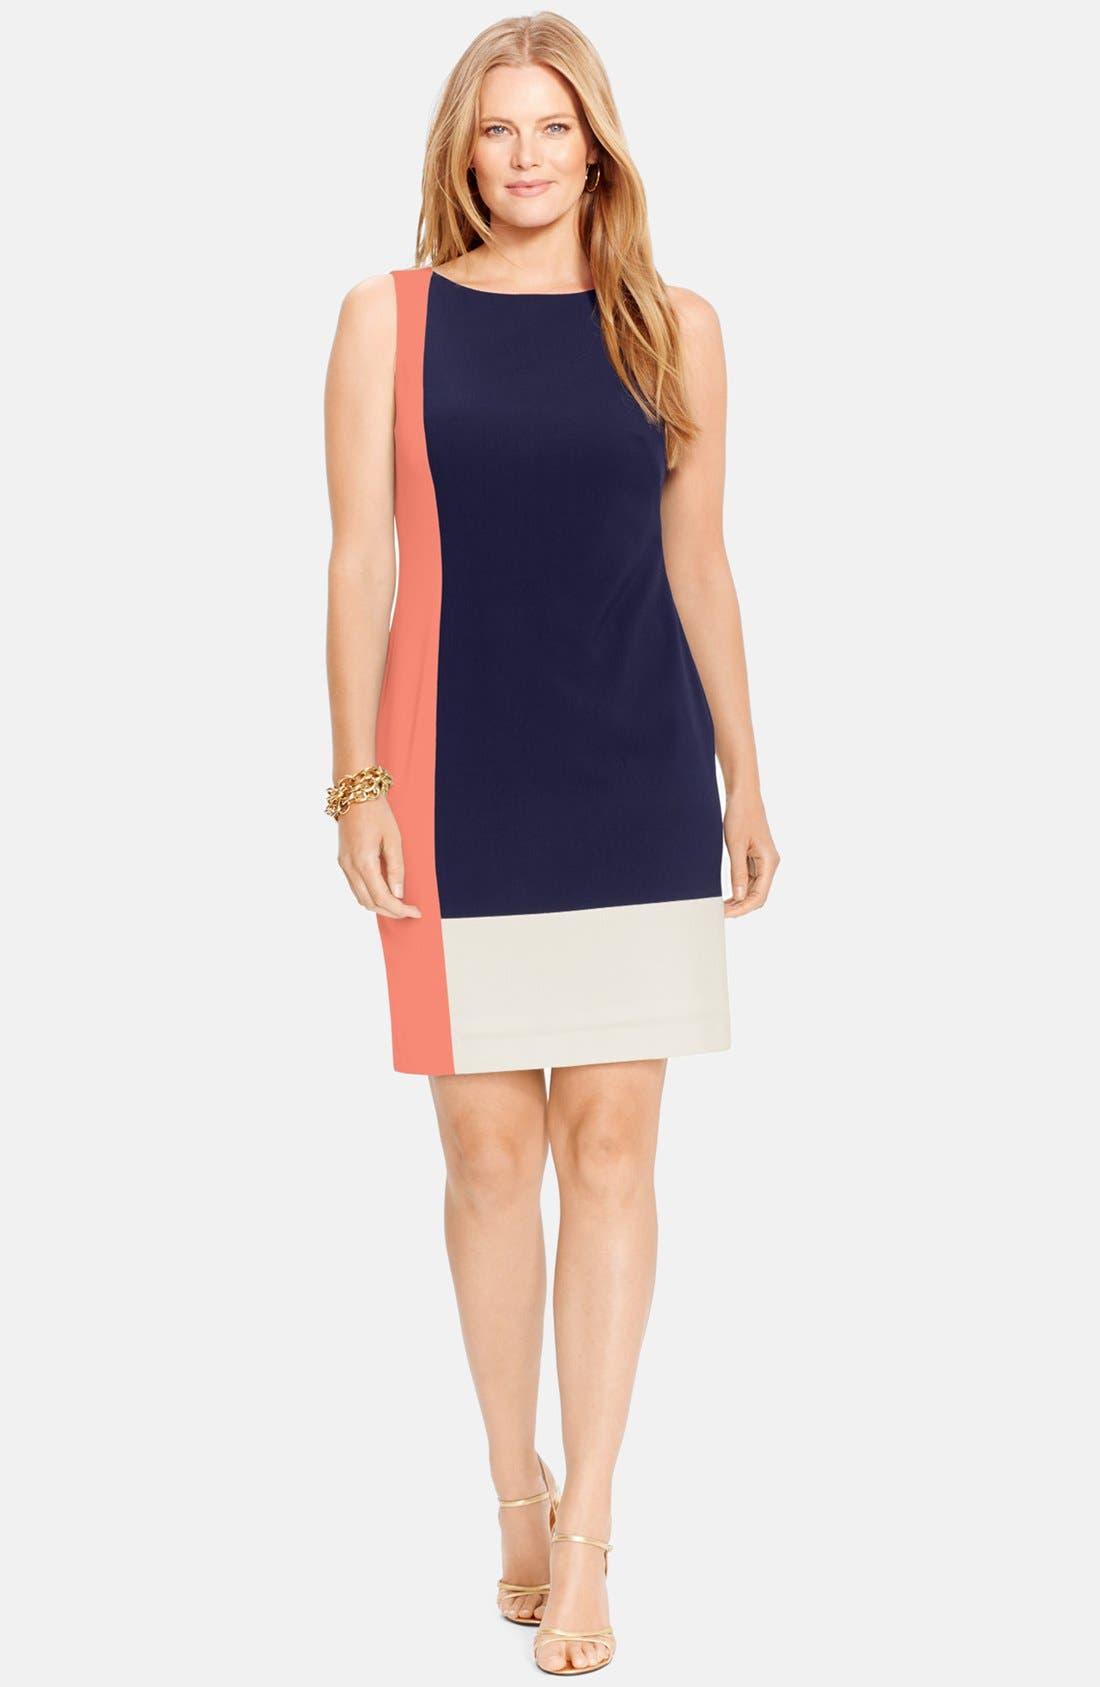 Alternate Image 1 Selected - Lauren Ralph Lauren Colorblock Sleeveless Sheath Dress (Plus Size)